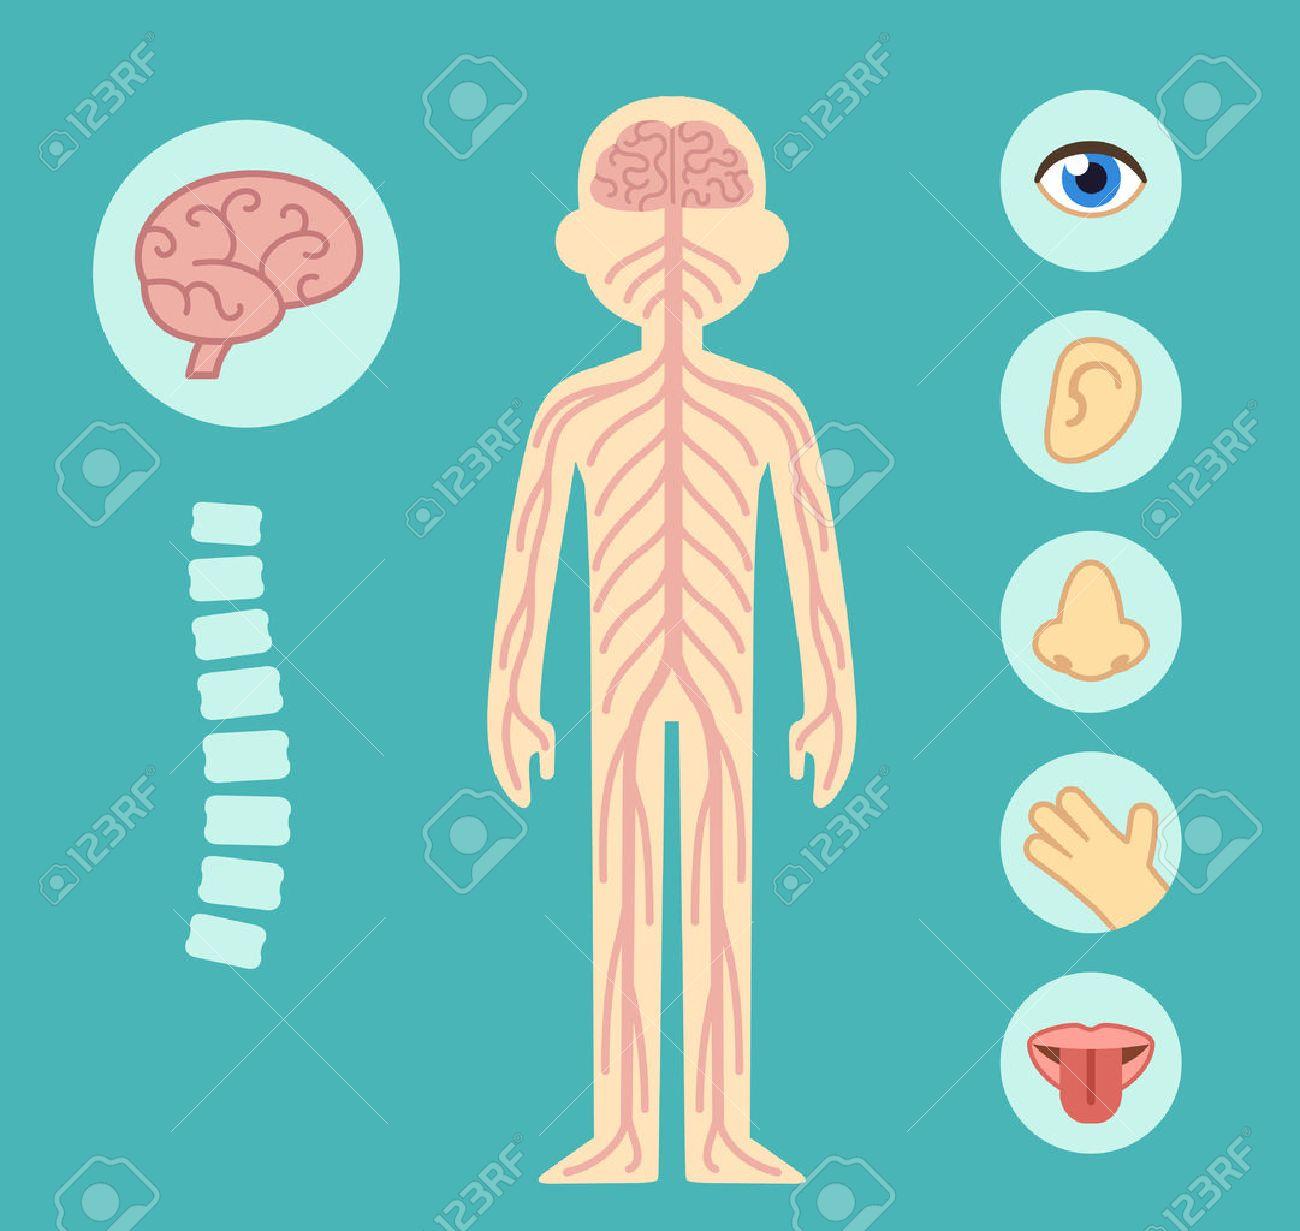 Nervensystem Infografik Diagrammelemente. Nerven Der Wirbelsäule ...